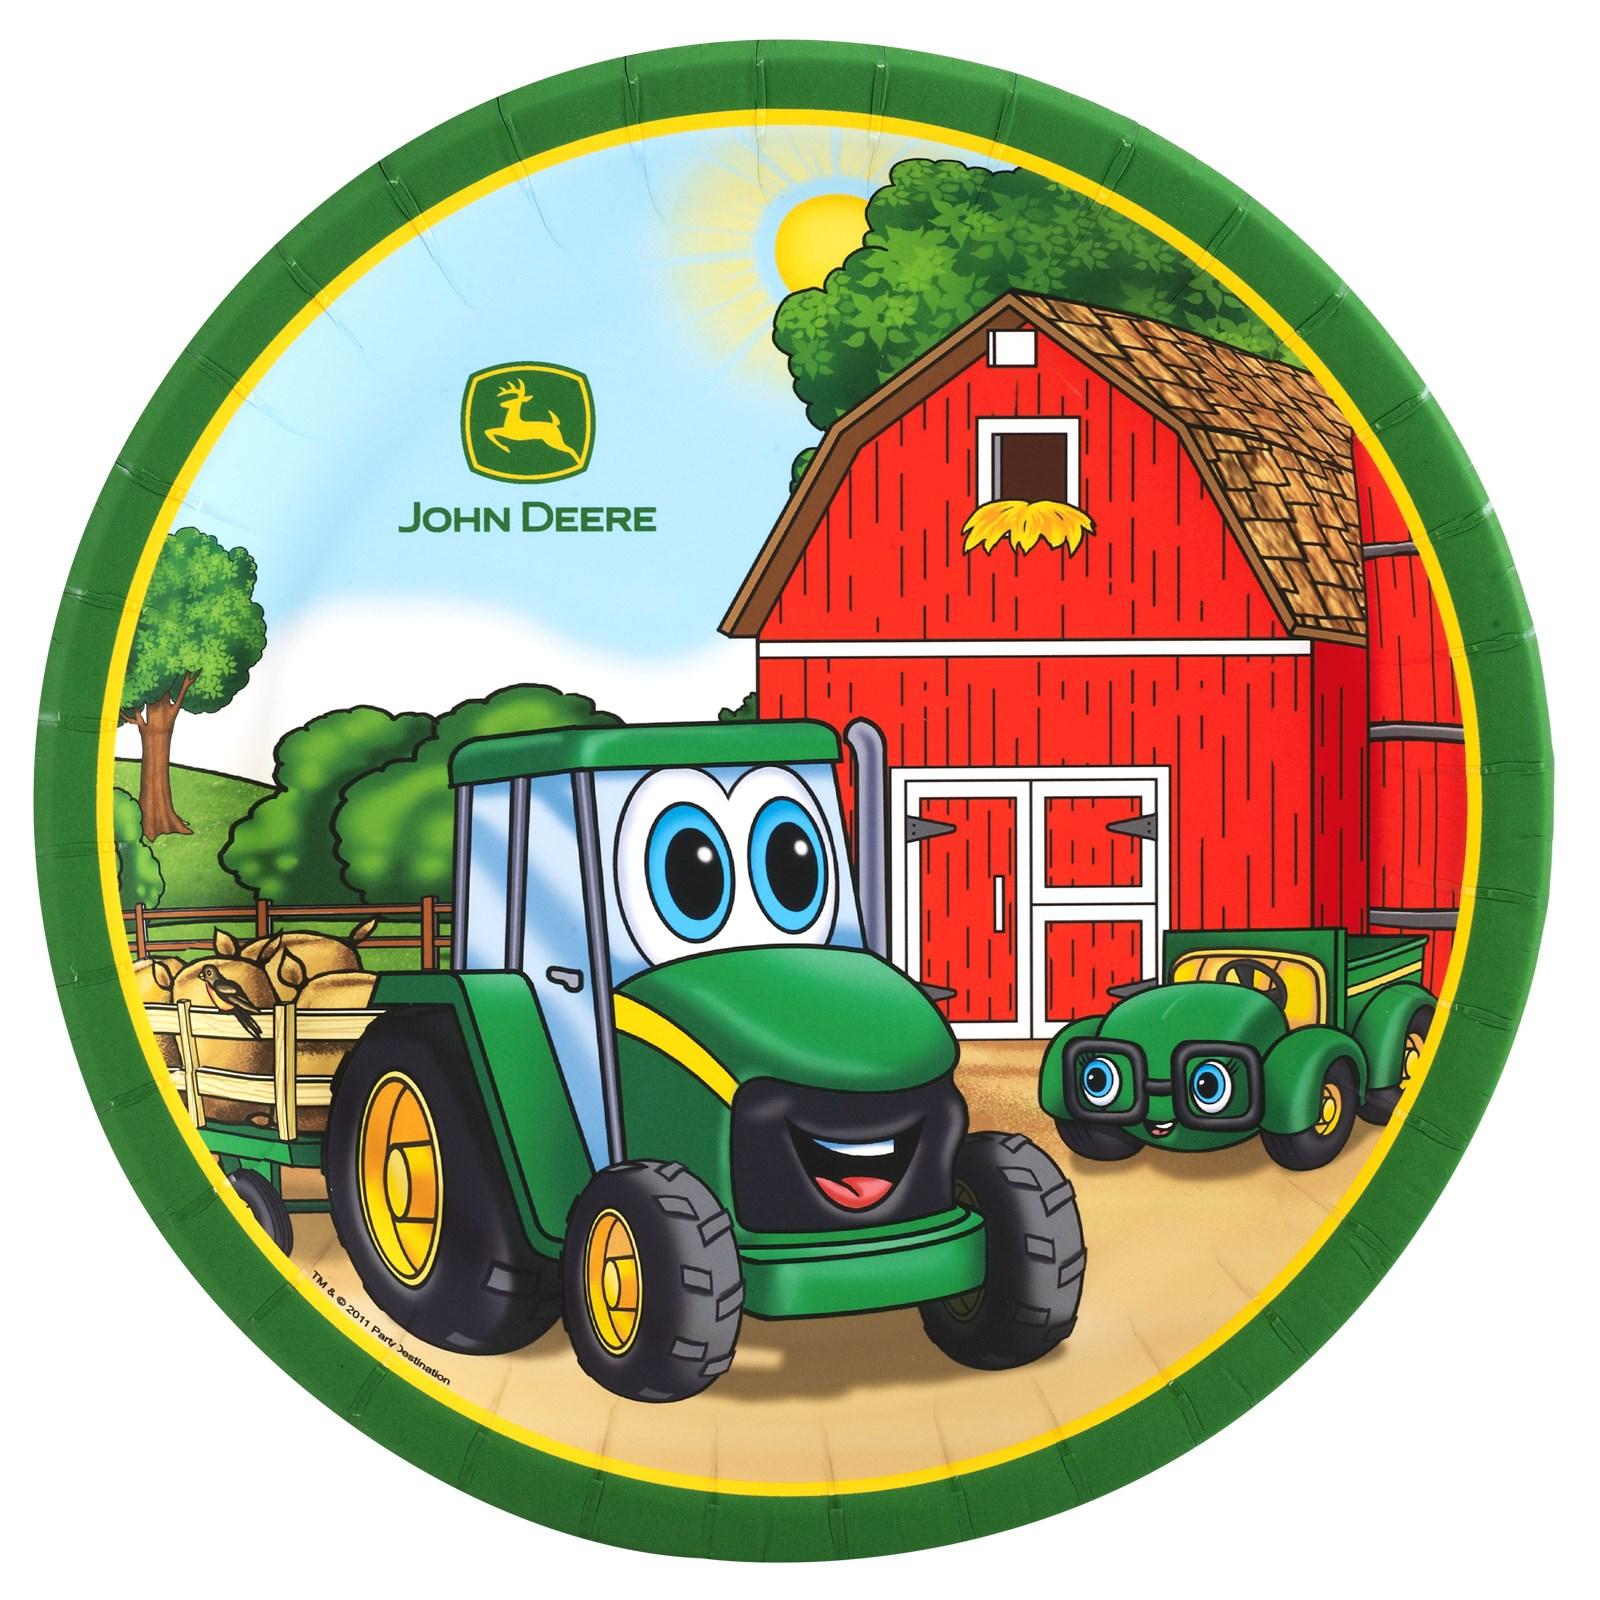 John Deere Johnny Tractor Dinner Plates